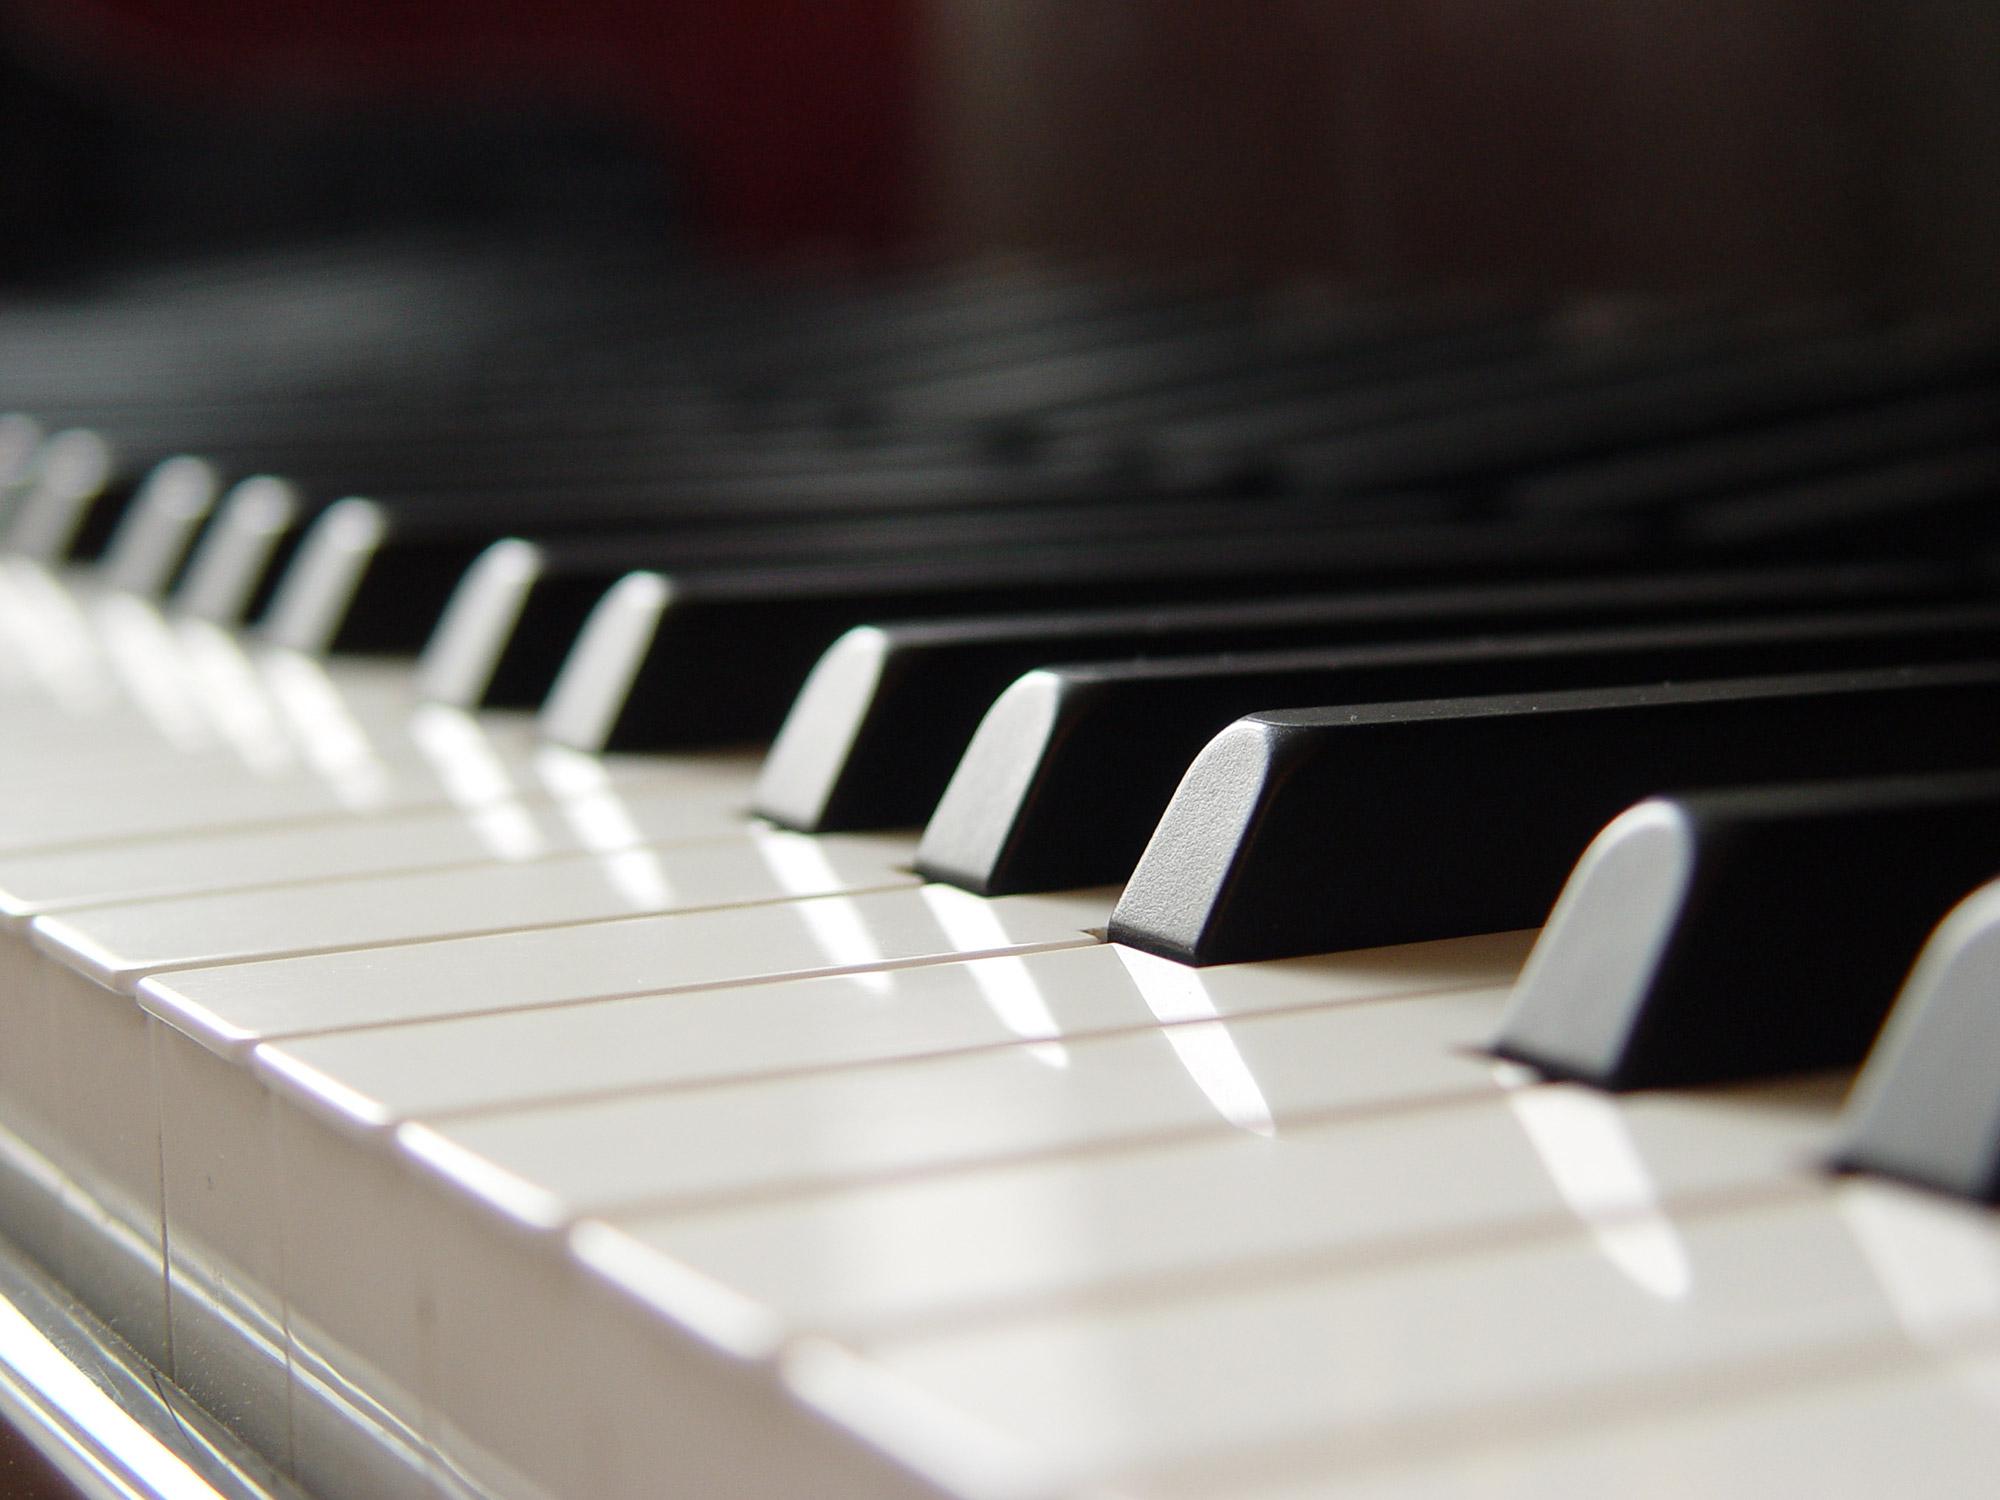 Картинки клавиши рояля, открытках